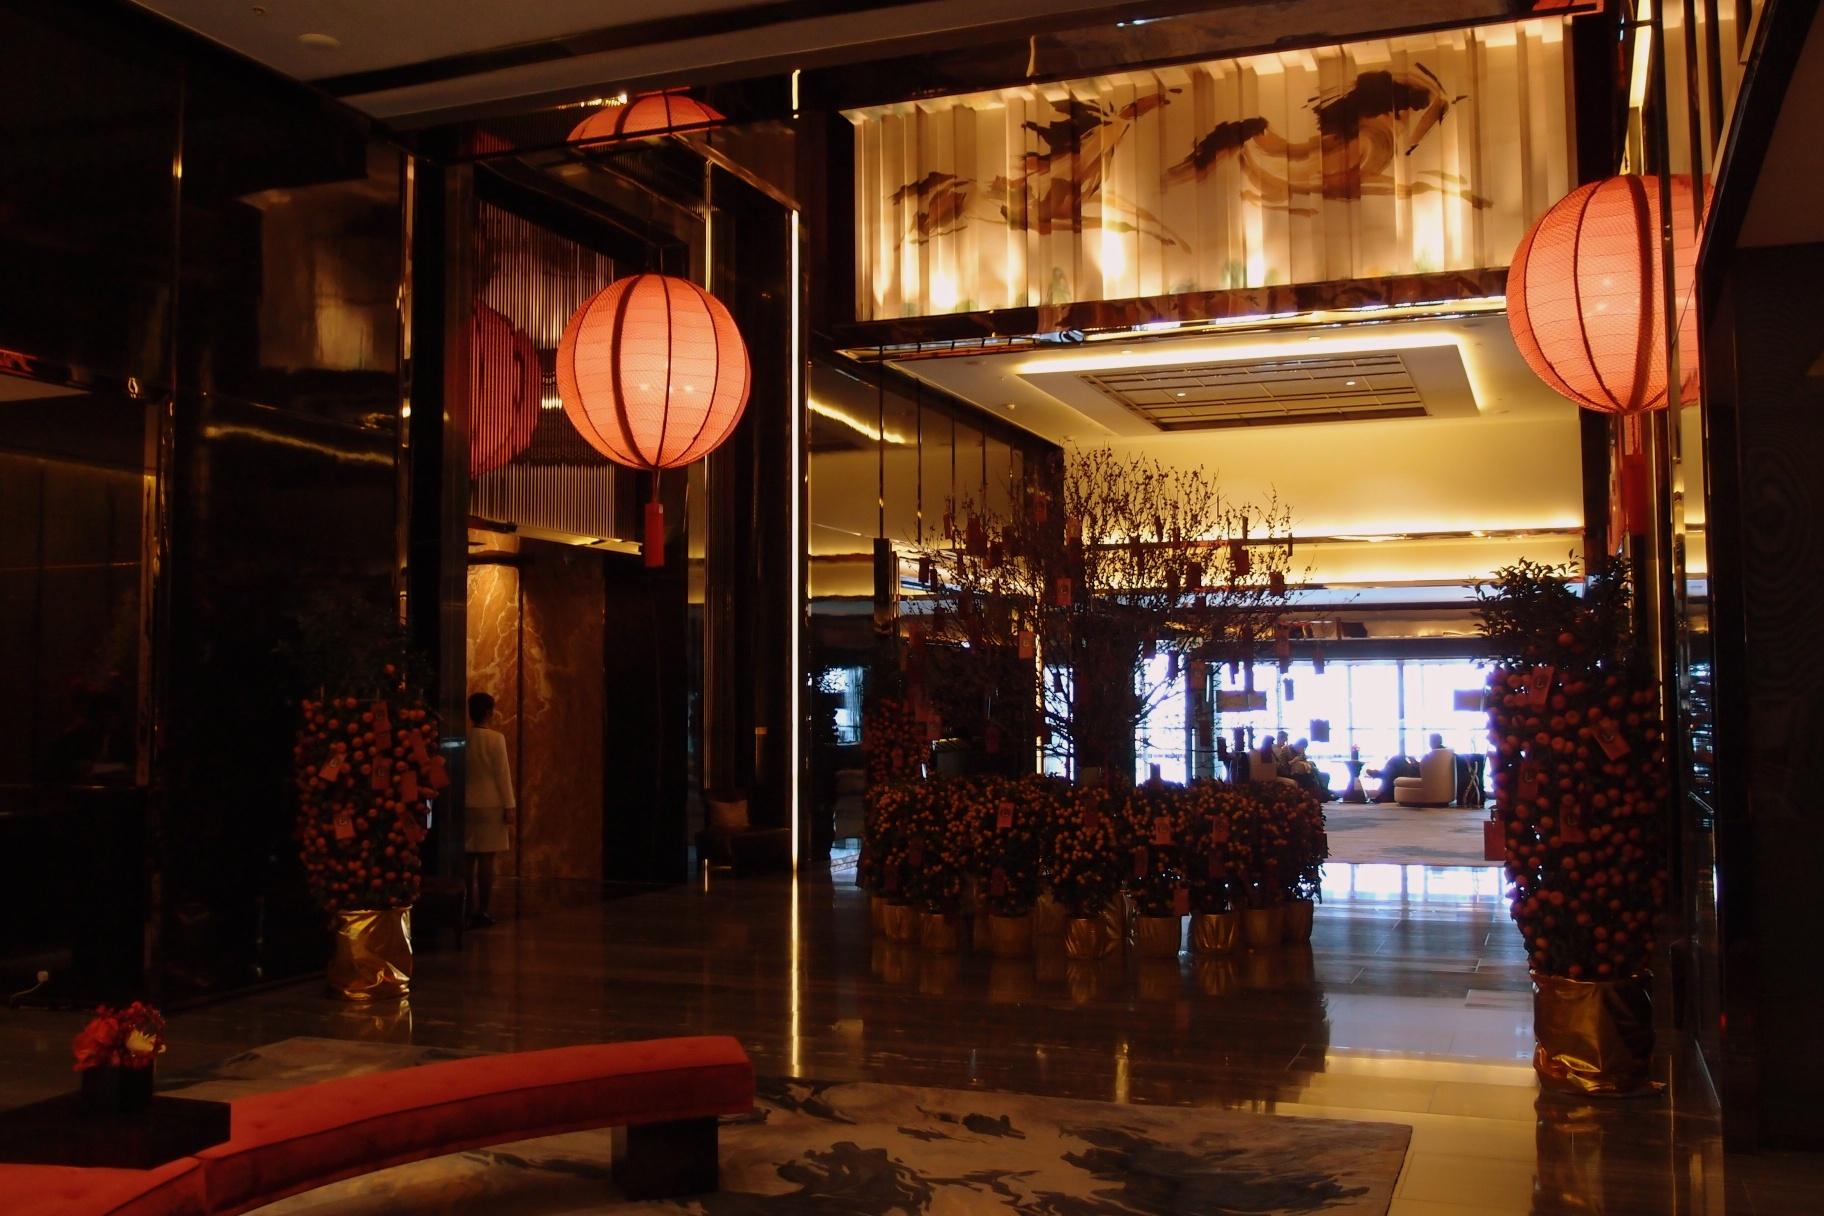 J3 Private Tours Hong Kong   J3 Private Walking Tours Hong Kong   The Ritz Carlton Hotel Lobby 103rd floor!